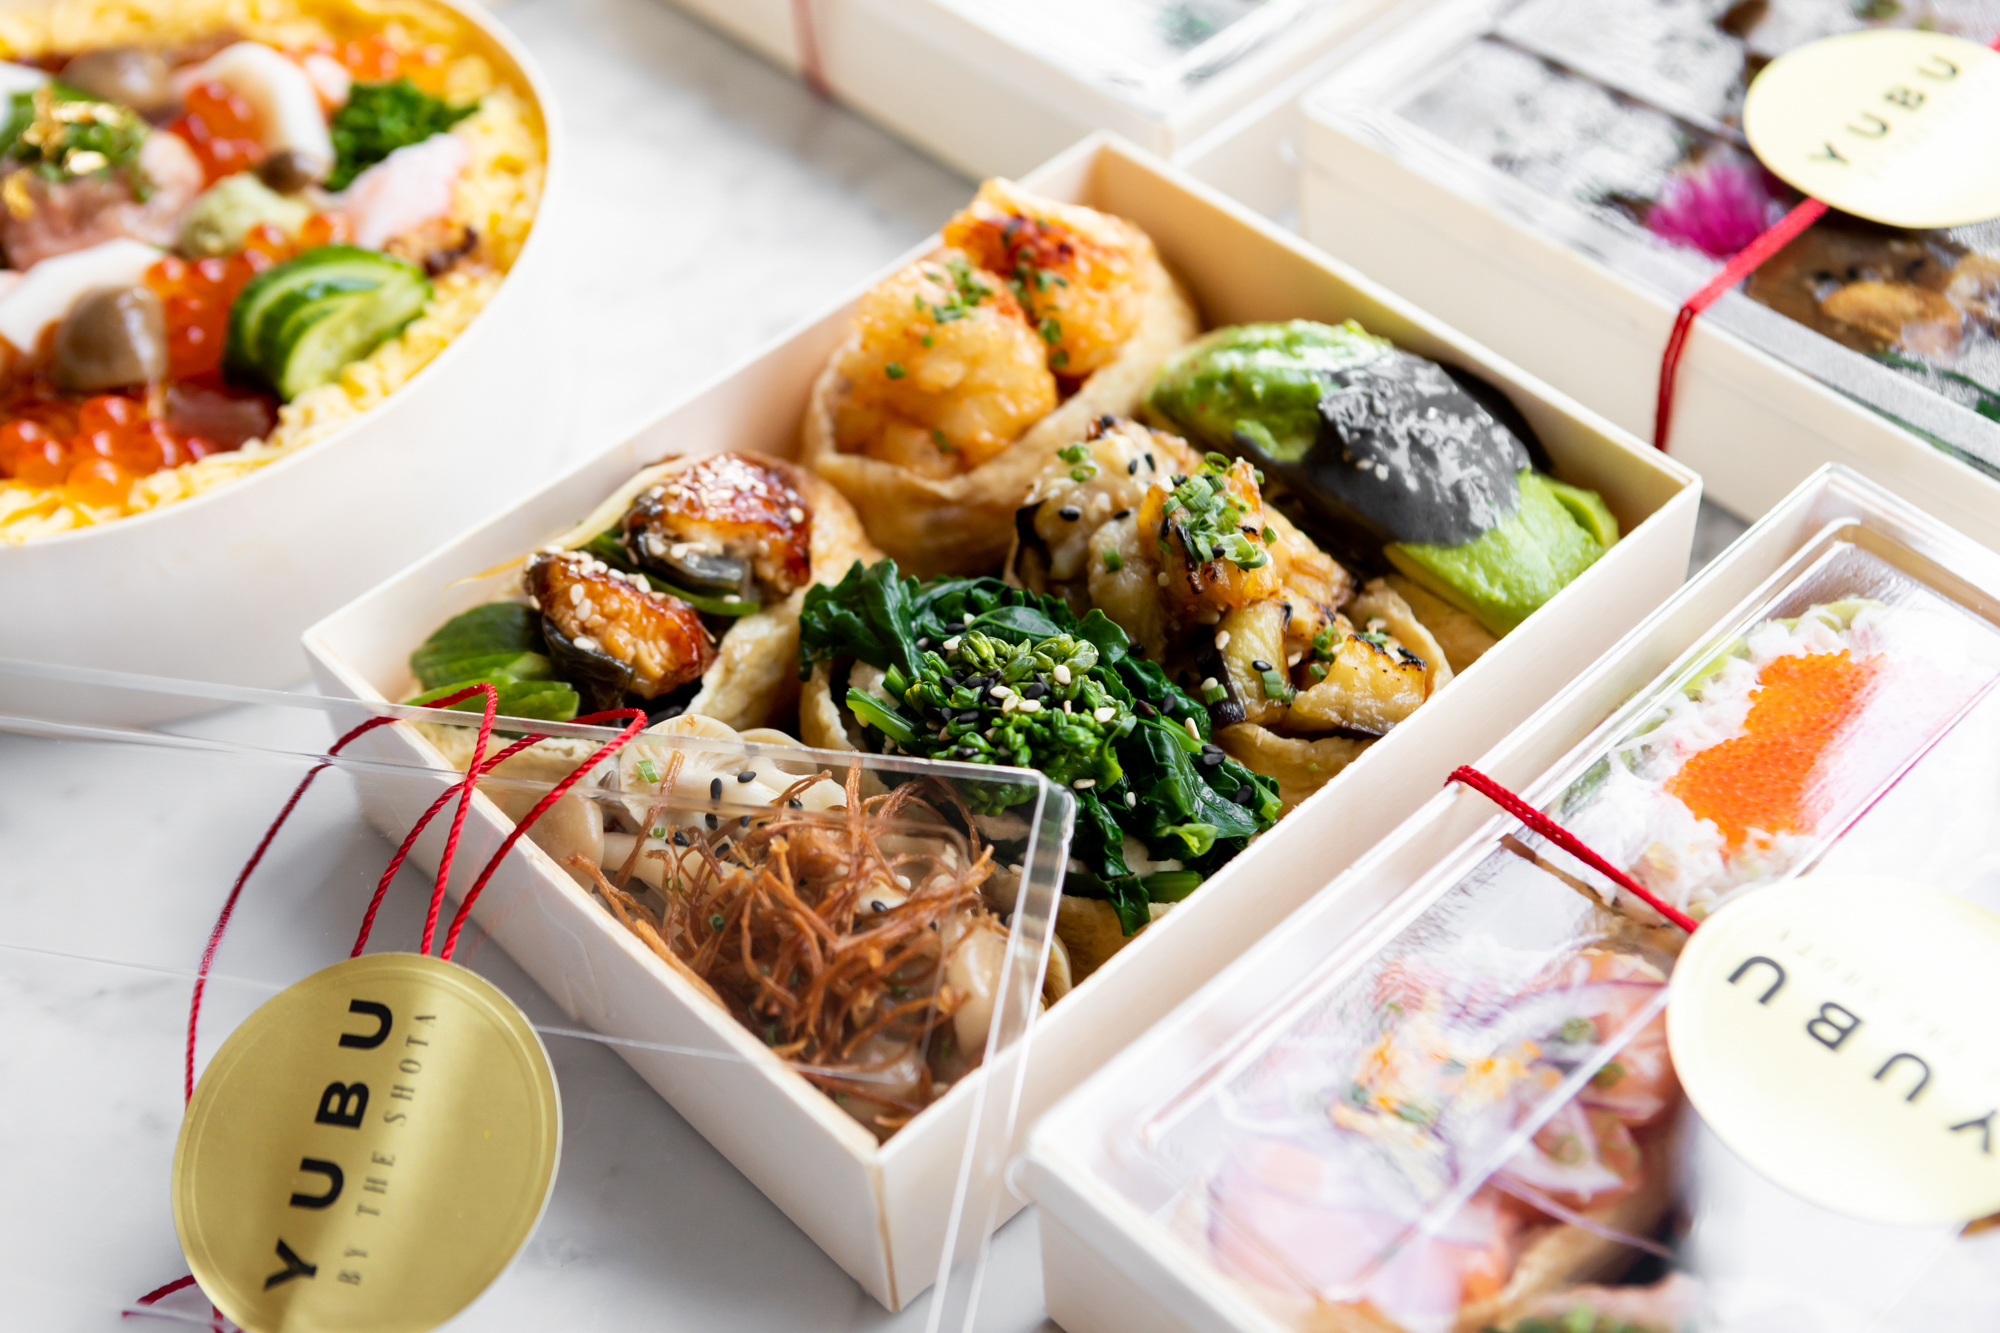 Takeout sushi from Yubu